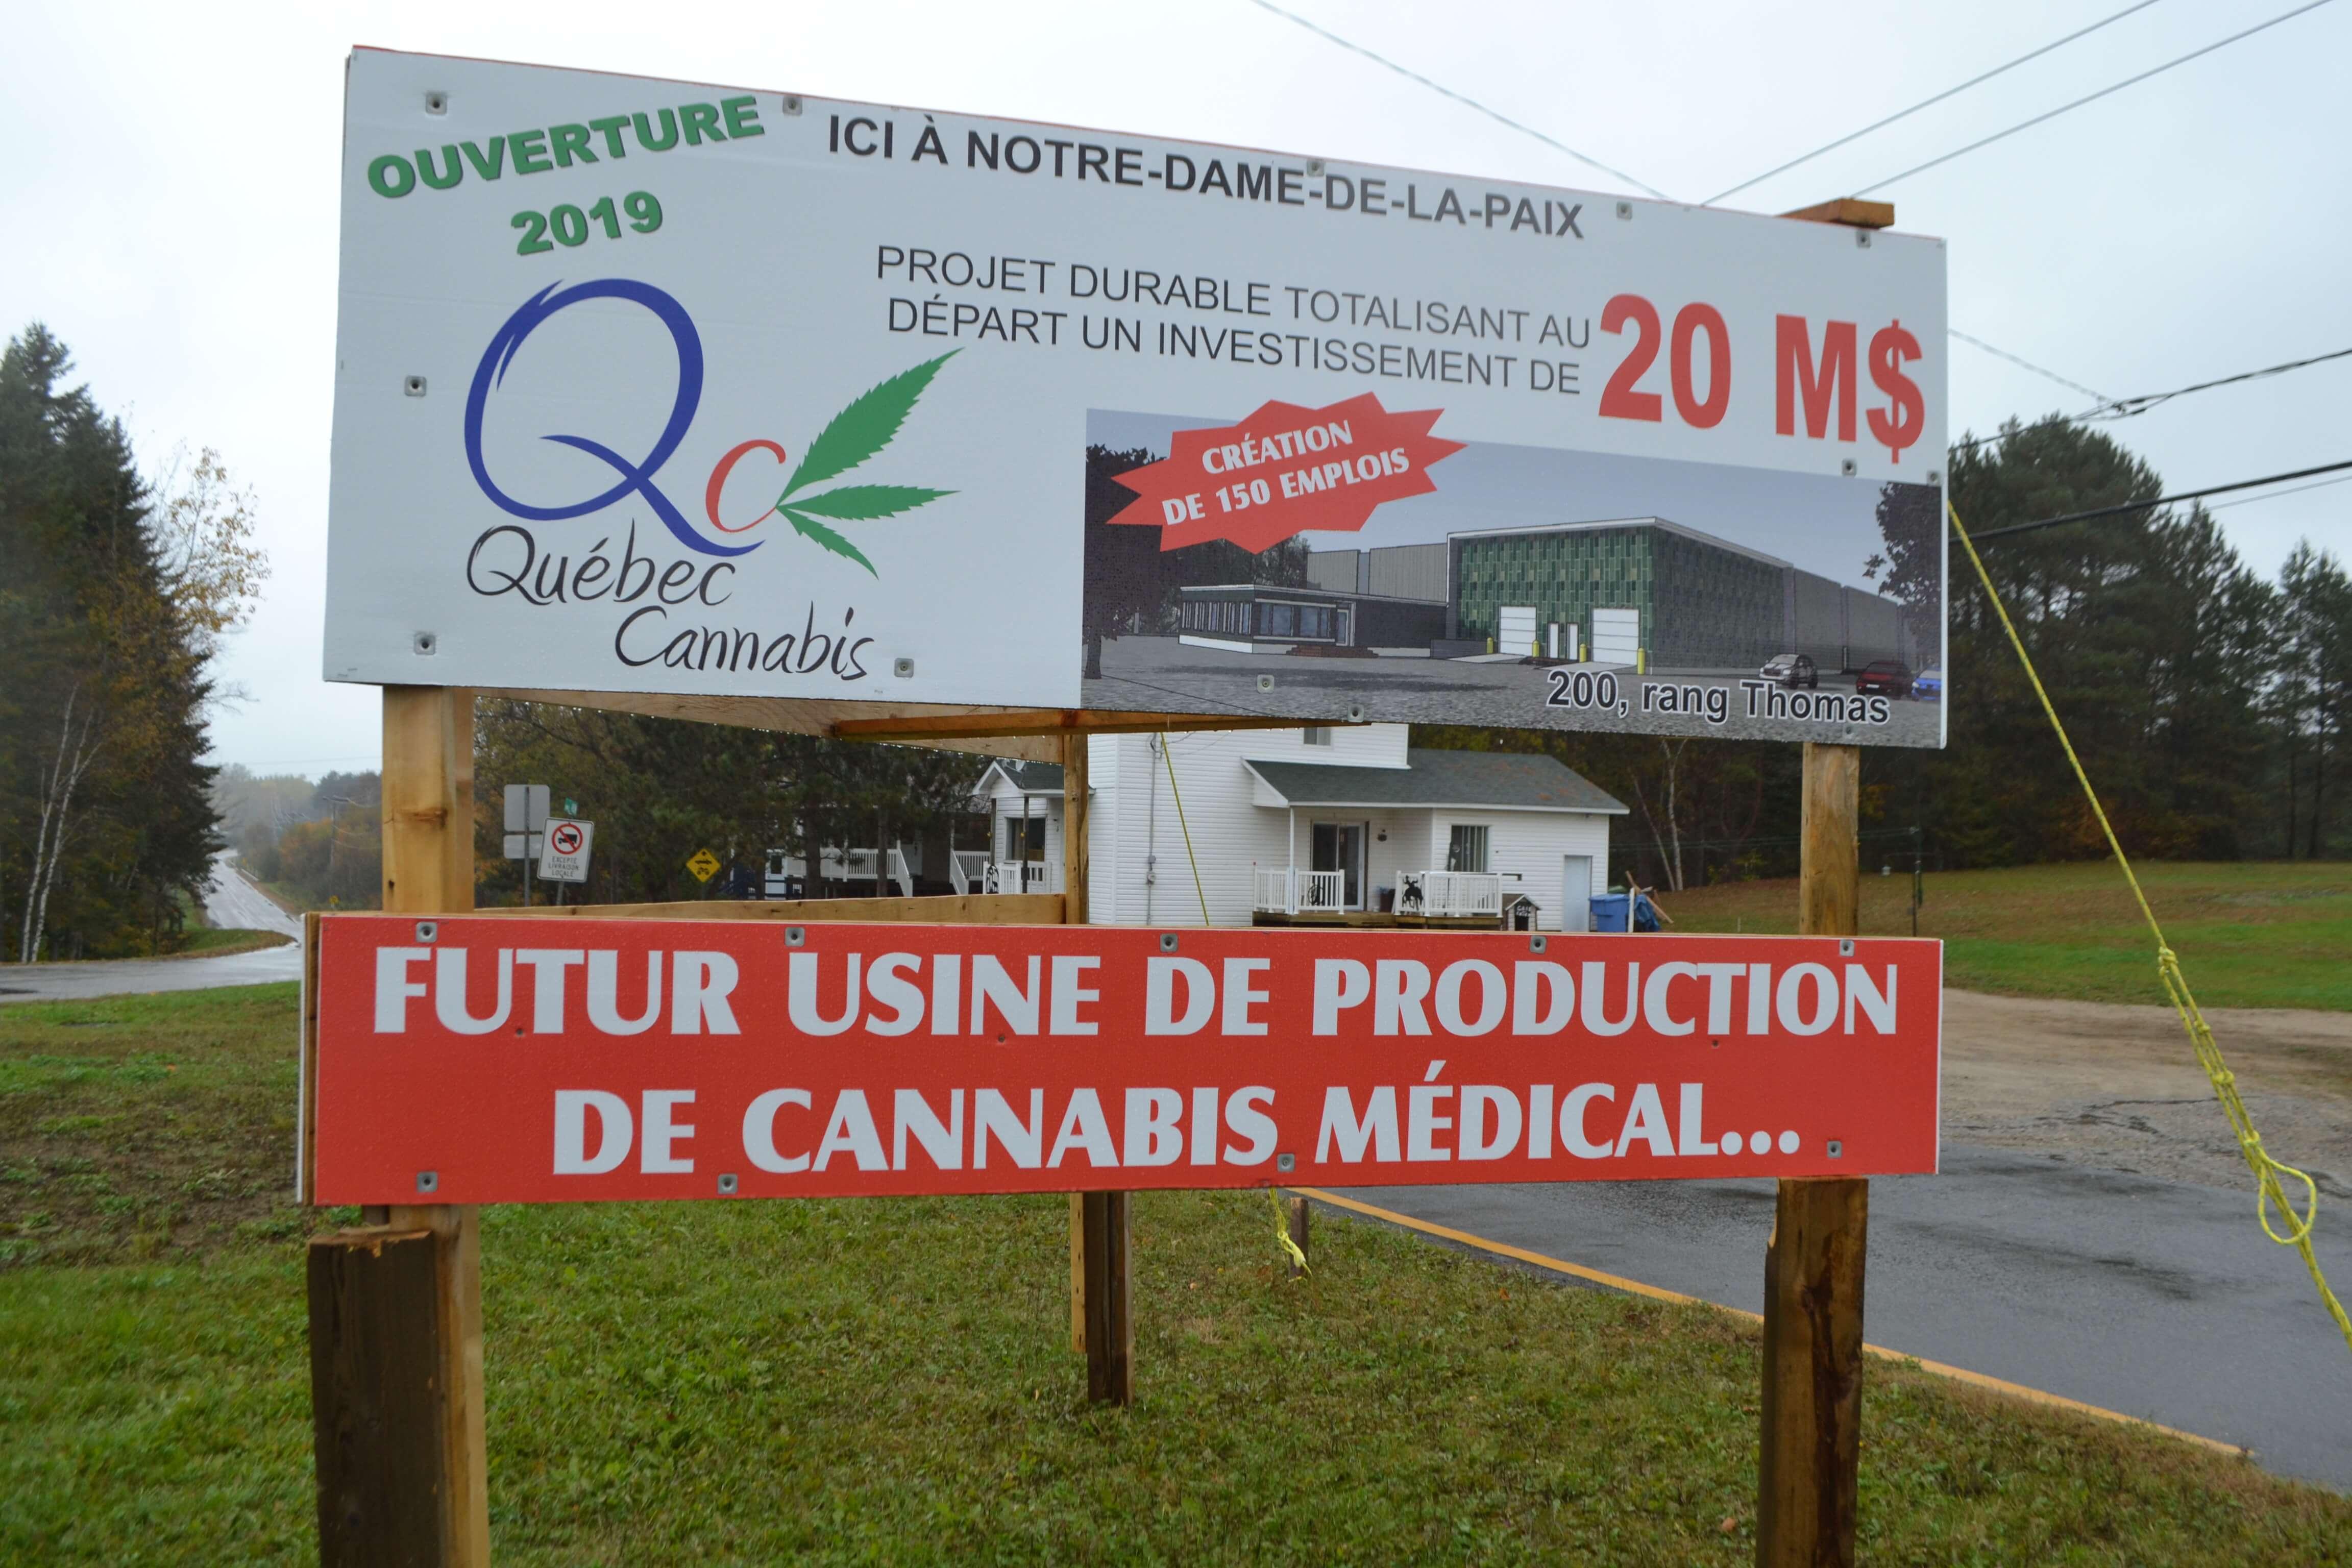 Québec Cannabis